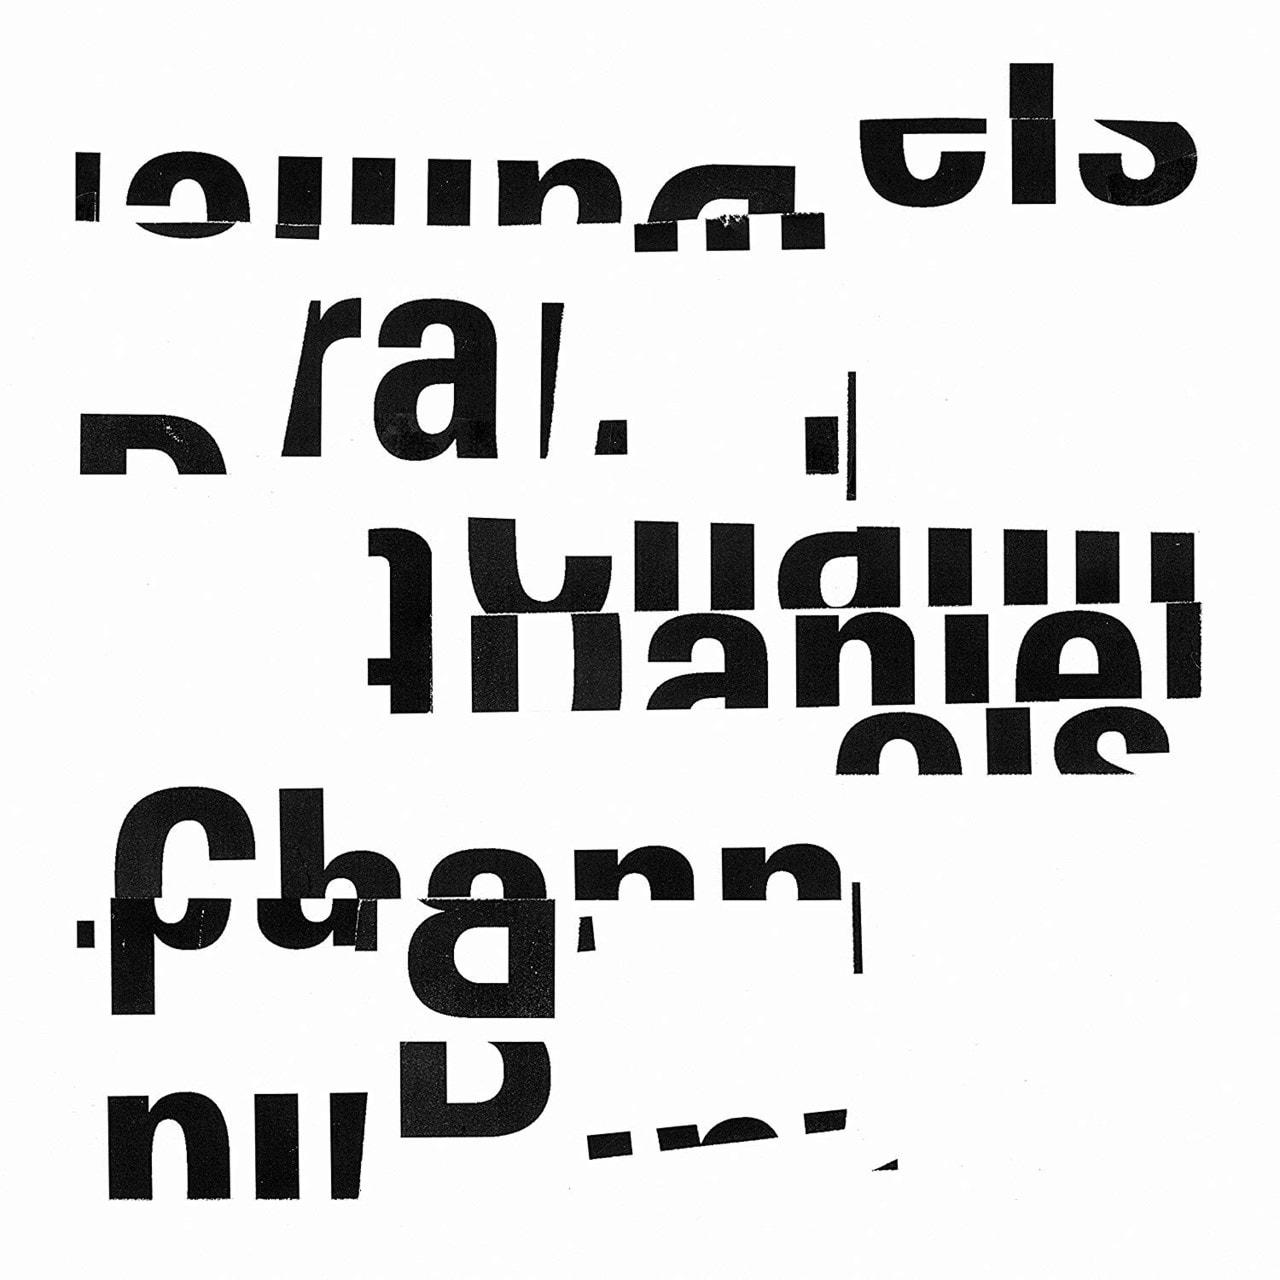 Channels - 1